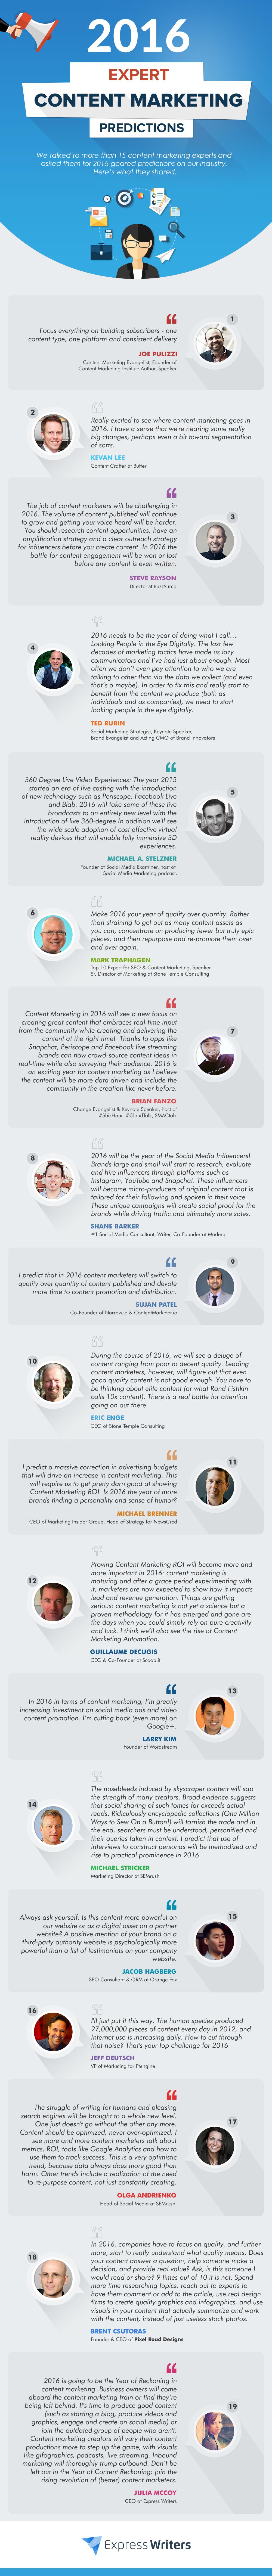 content marketing predictions 2016